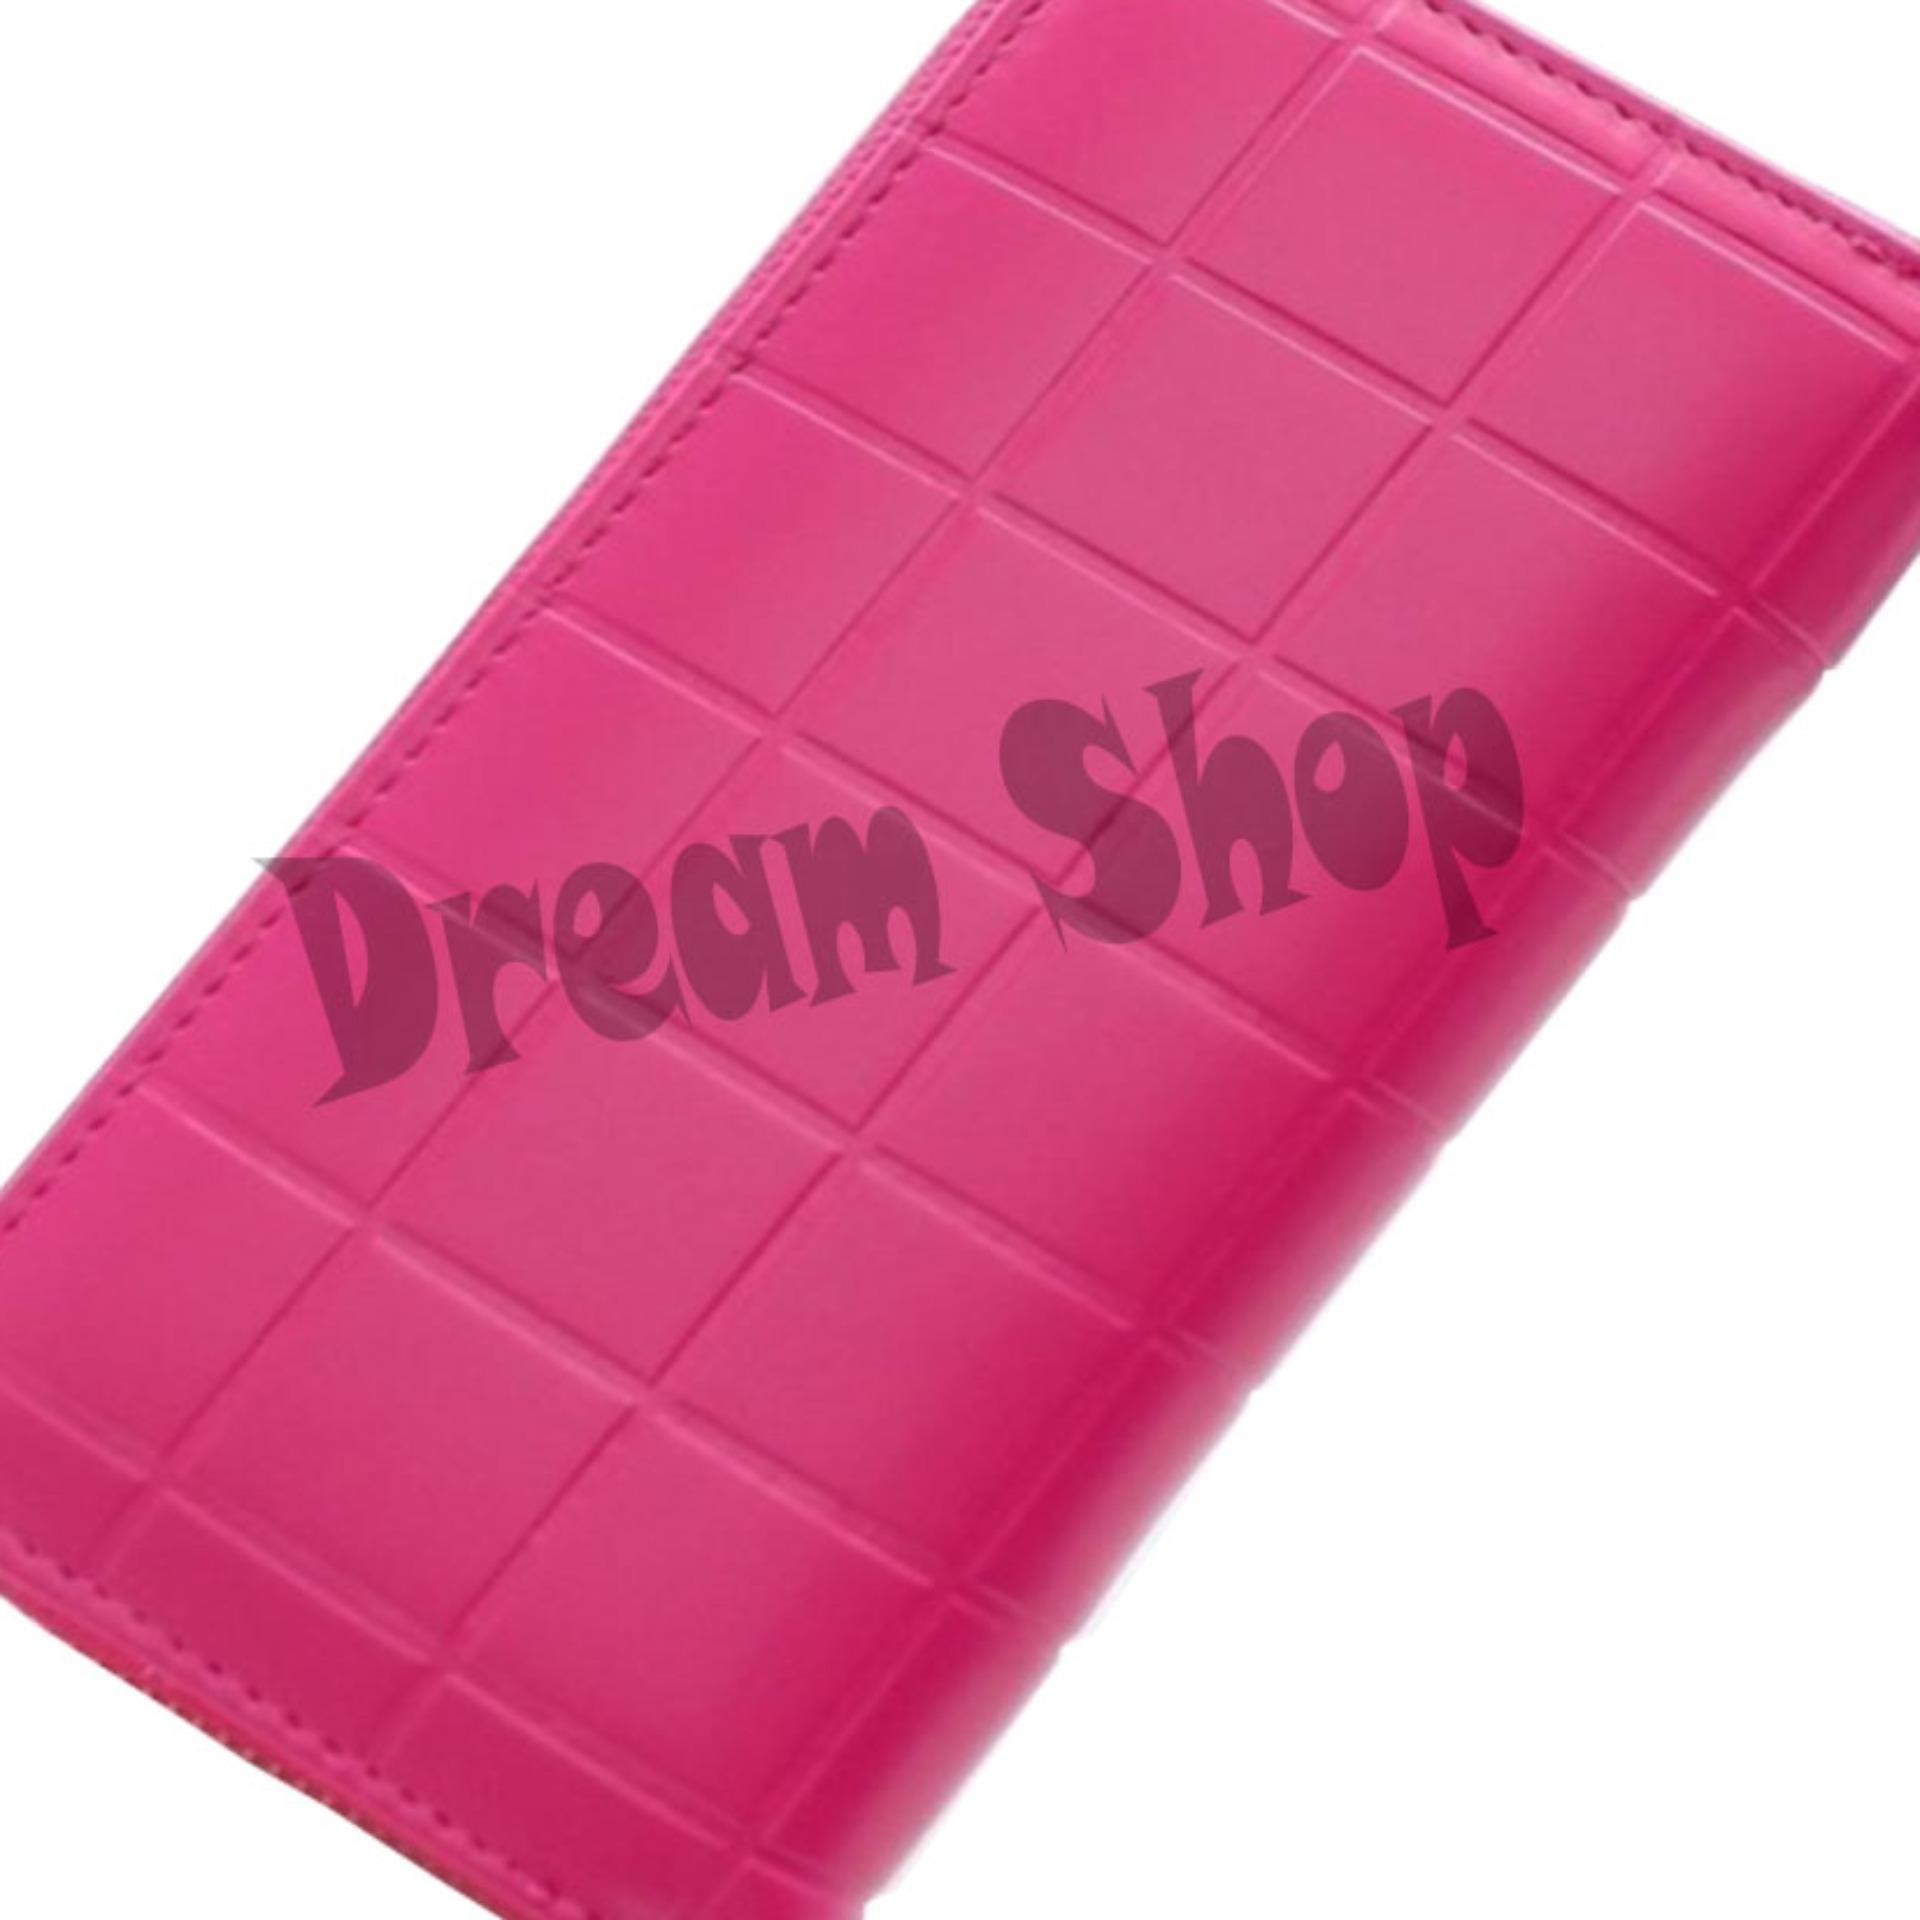 Dream Shop - Dompet Fashion Wanita - Oliver Wallet (PInk)